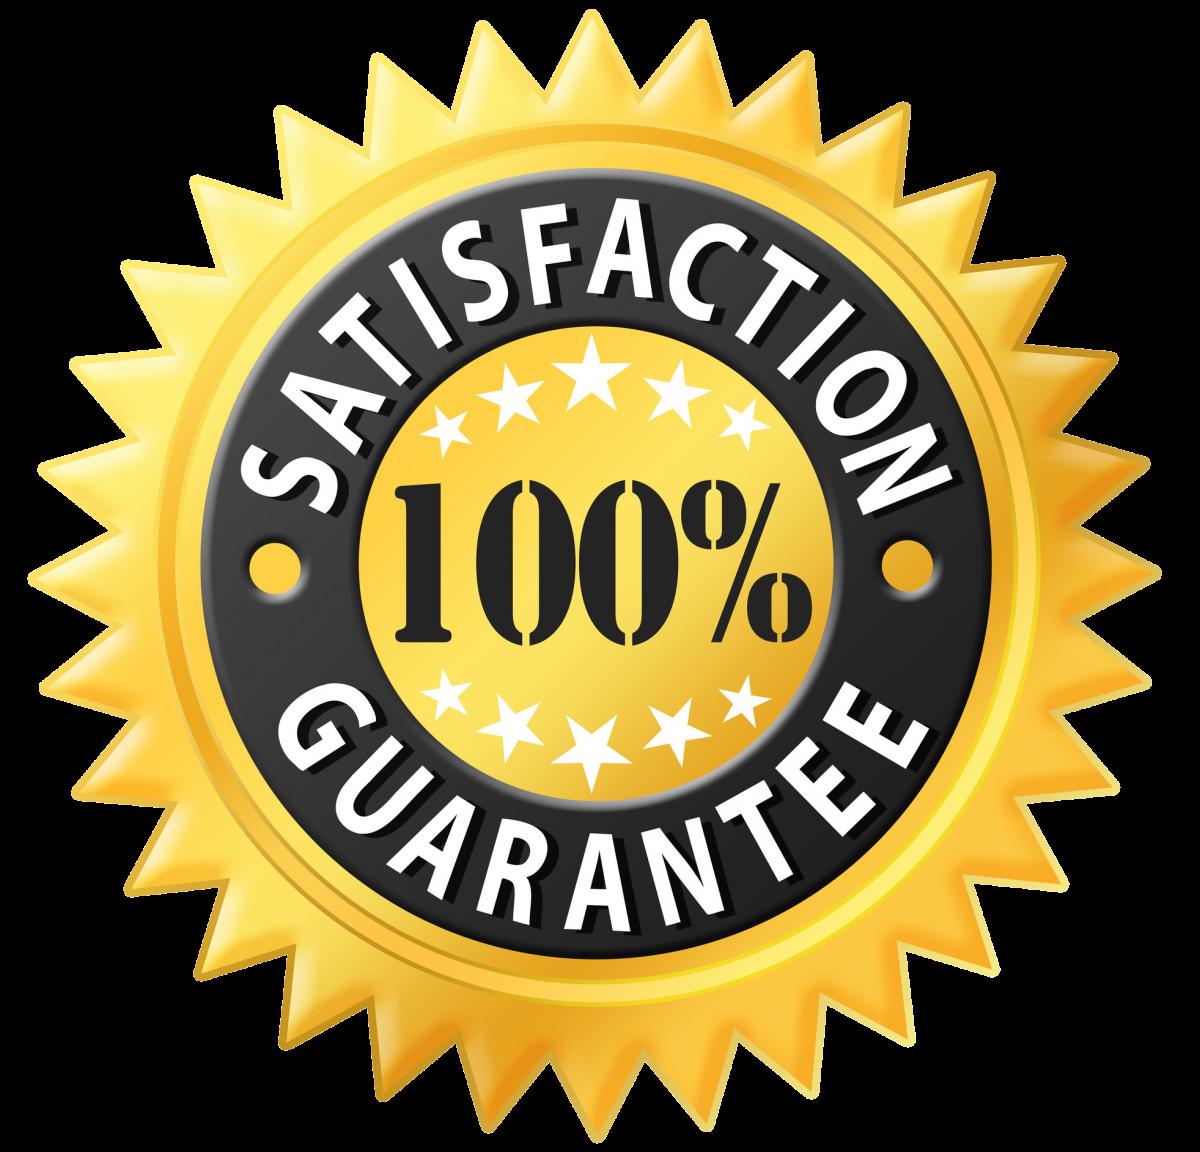 60 Day Money Back Guarantee Best Price Guarantee.